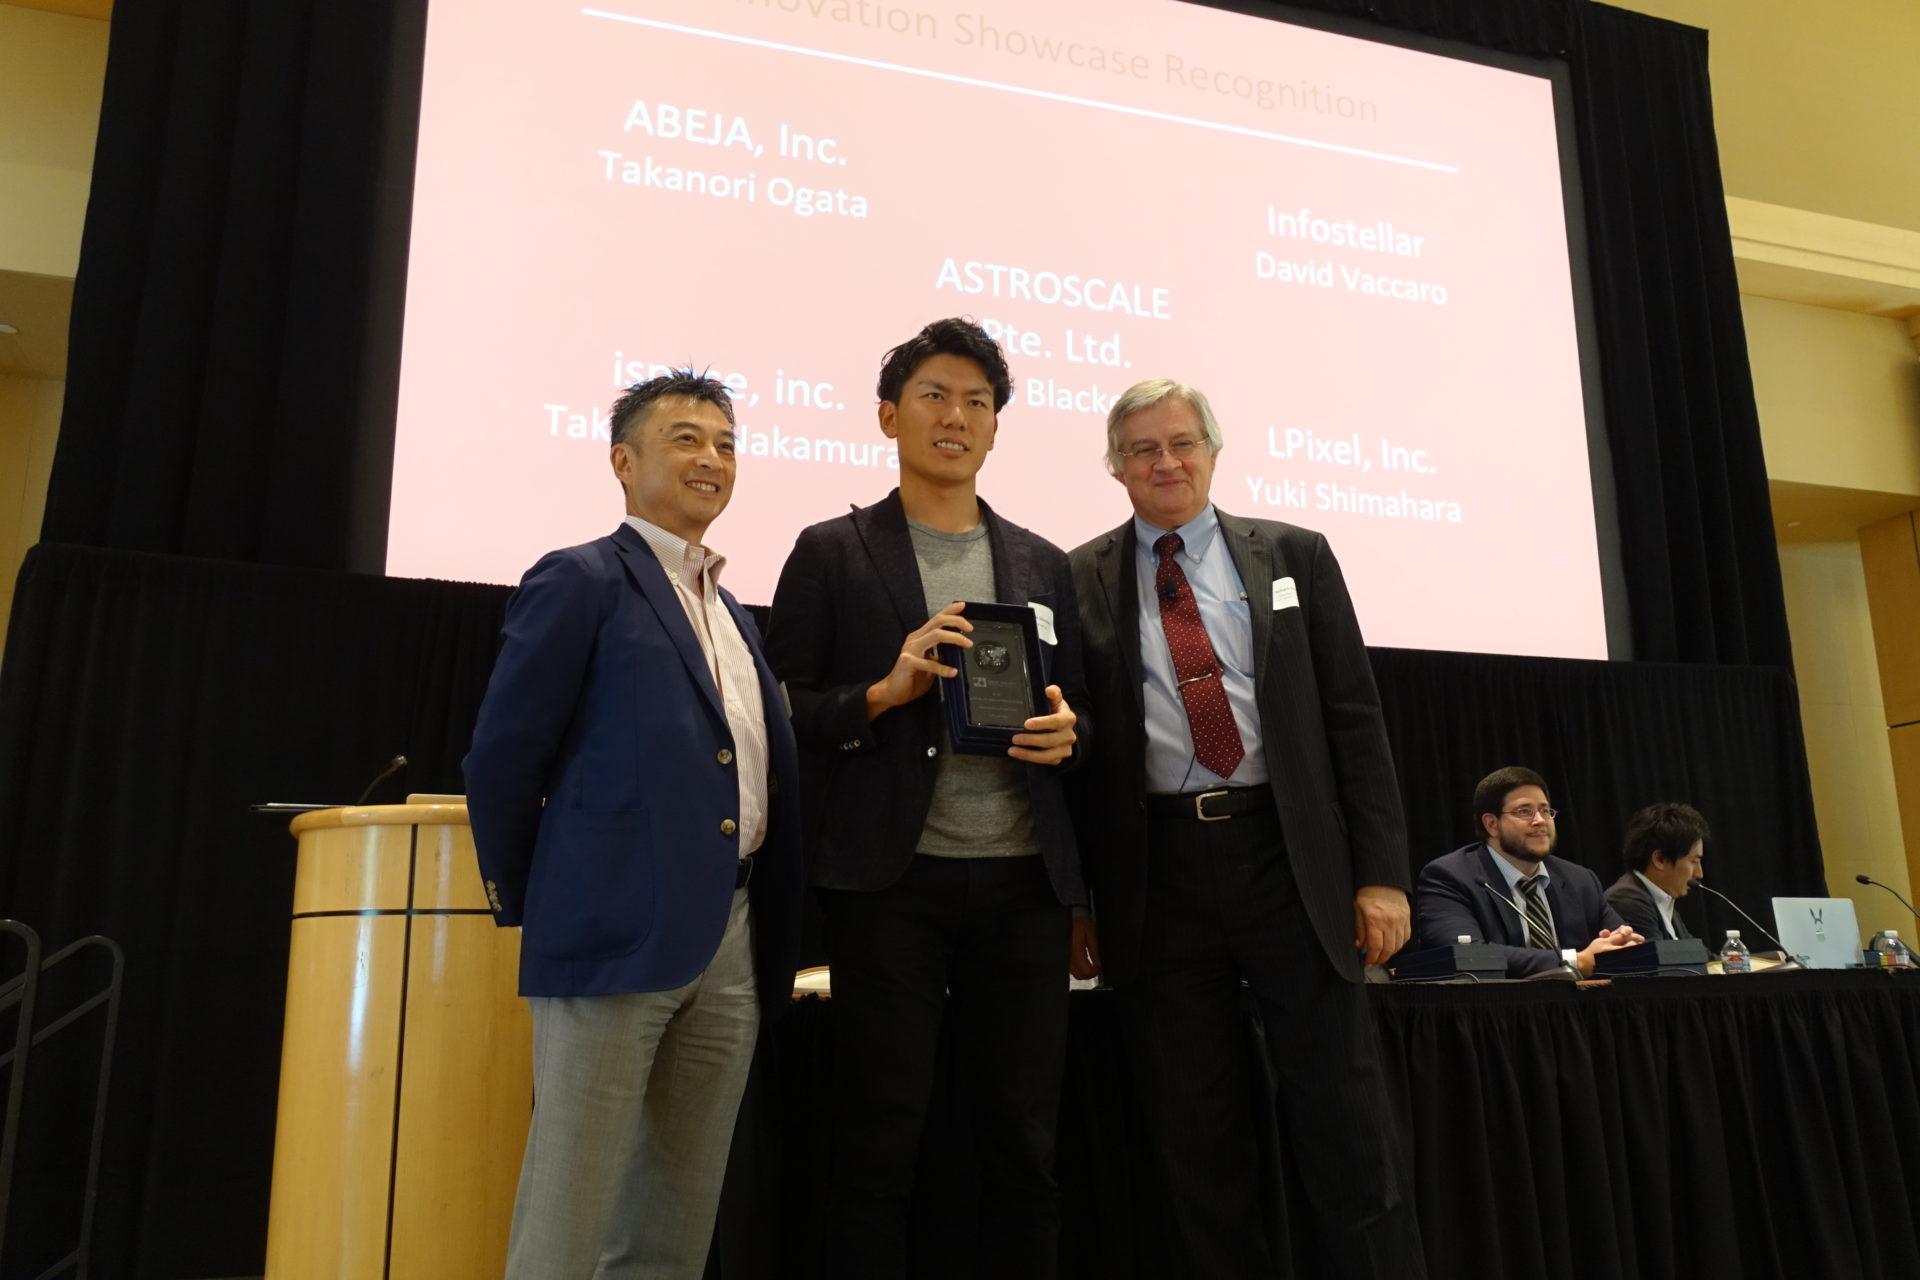 japan us innovation awards 2018 にて innovation showcase に選出